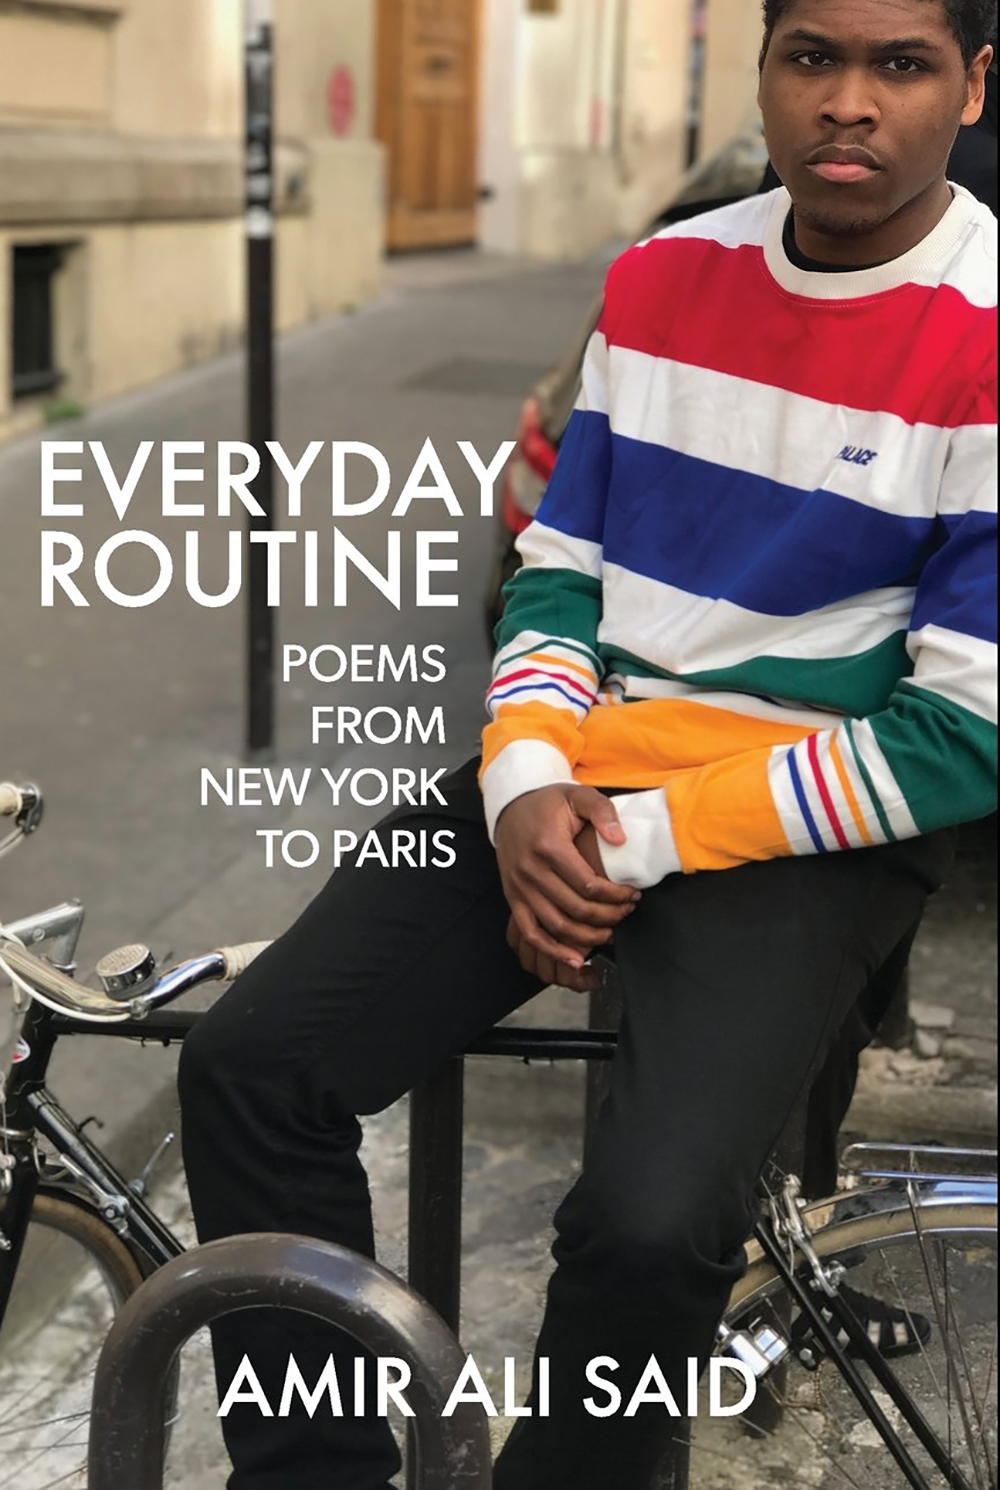 Everyday_Routine_SB_thumb.jpg